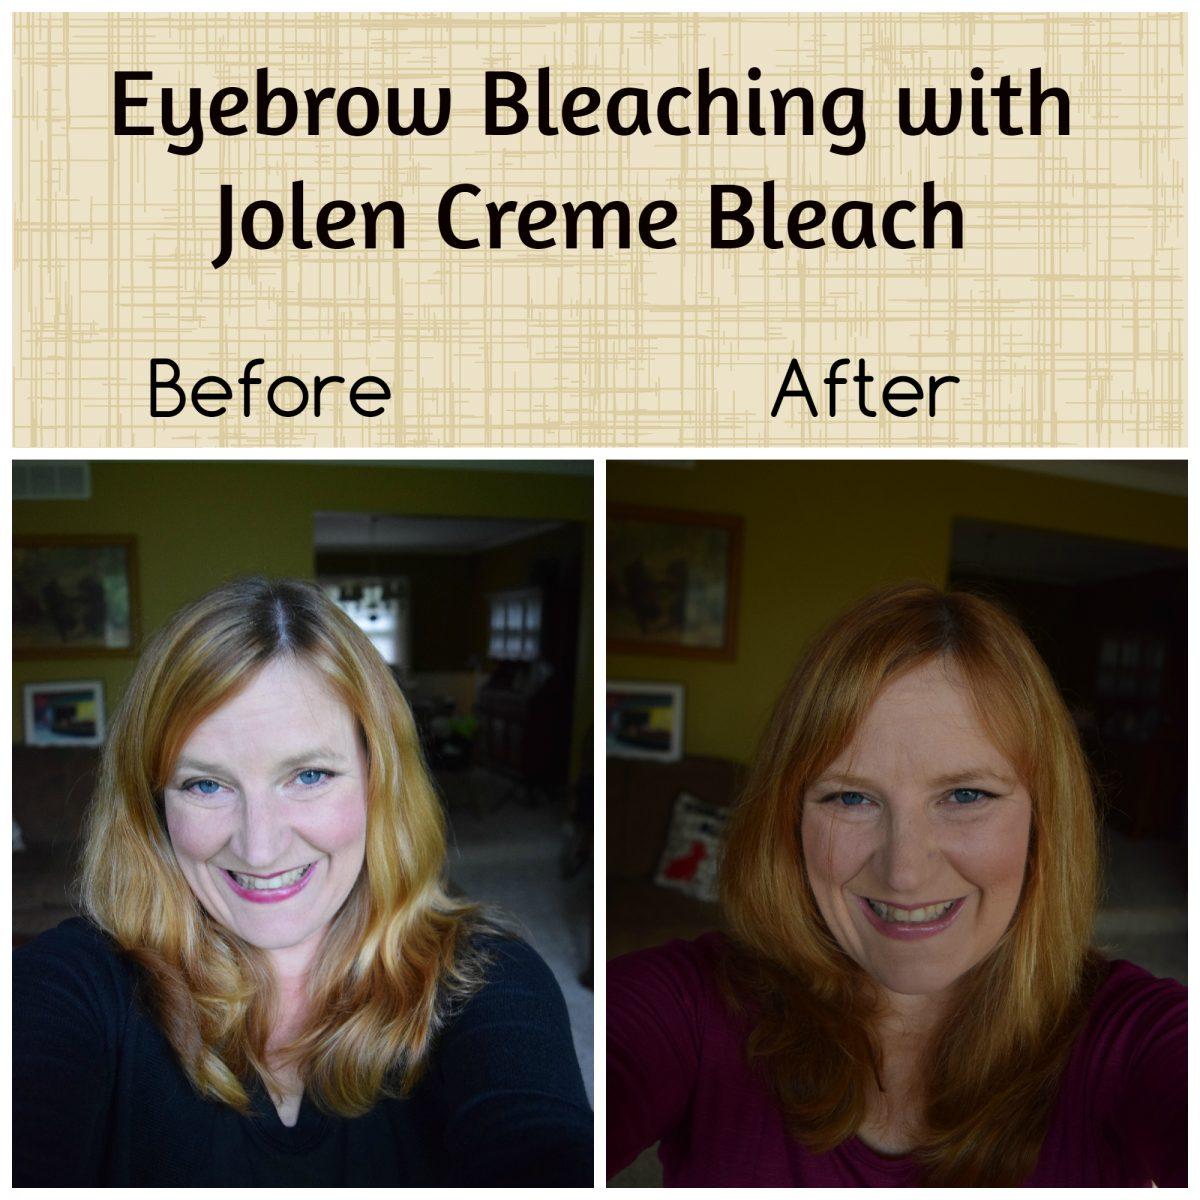 Eyebrow Bleaching with Jolen Creme Bleach | Beauty and